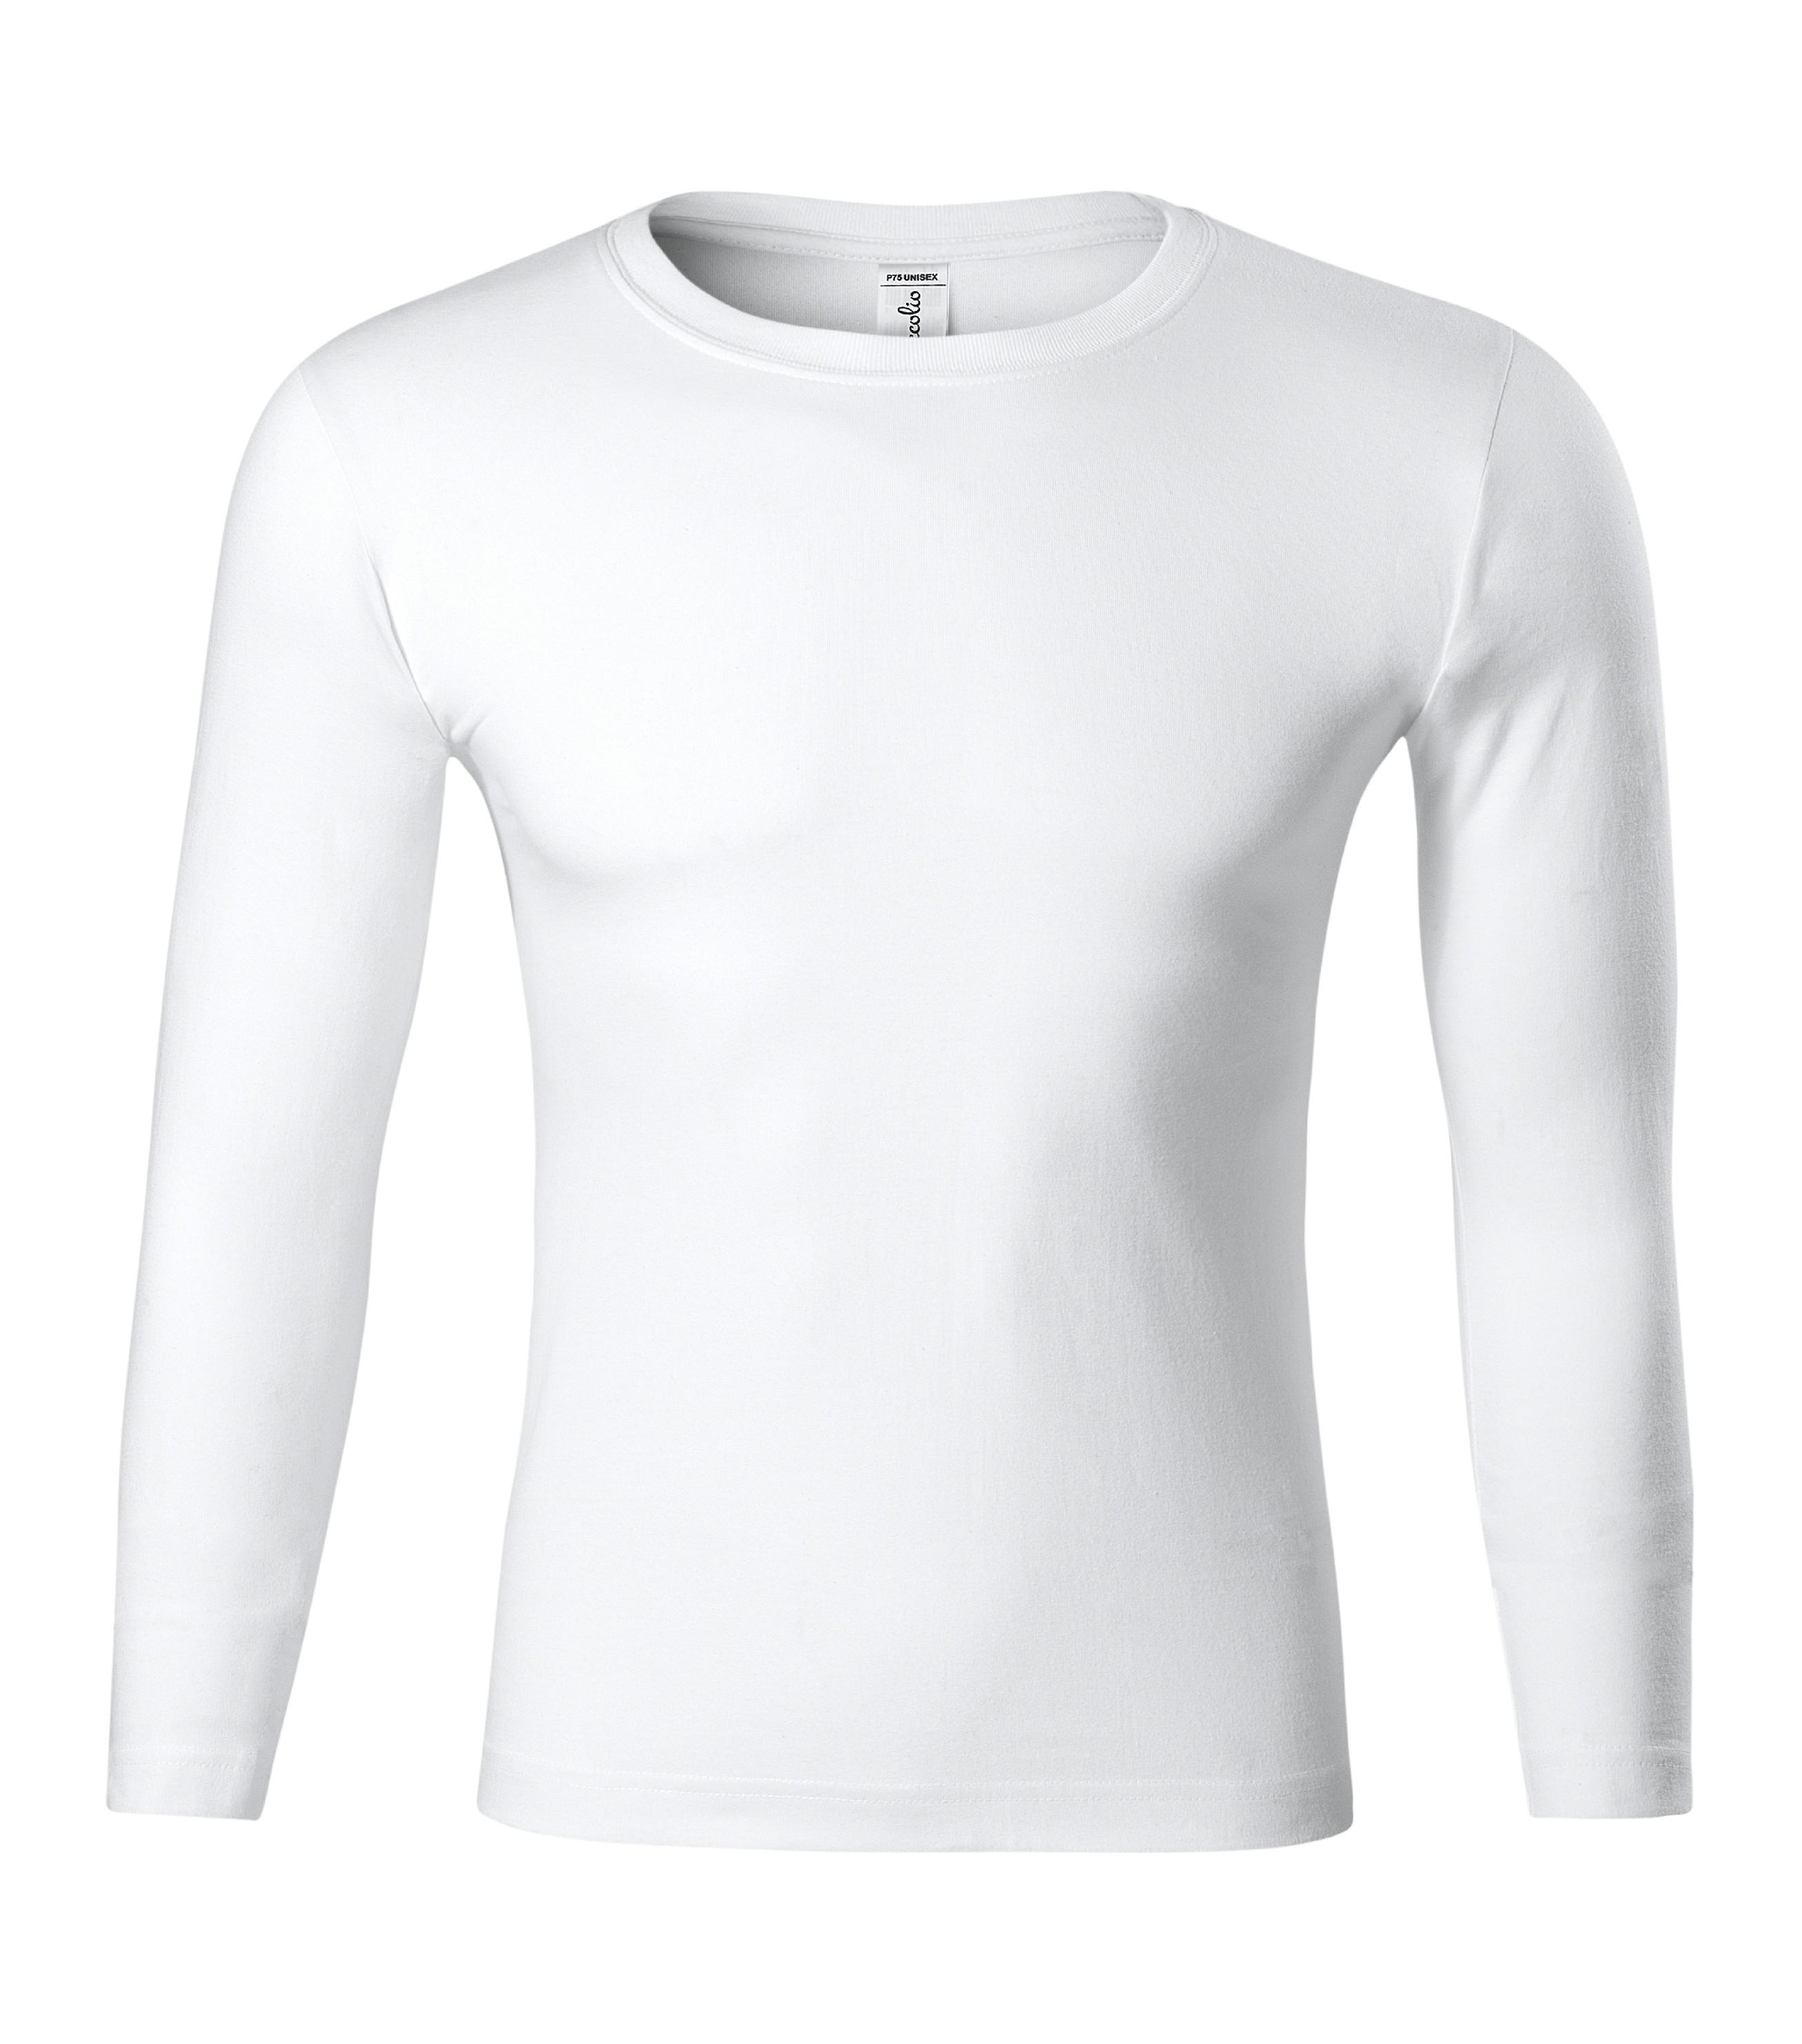 Triko unisex Progress LS Barva: Bílá, Velikost: M